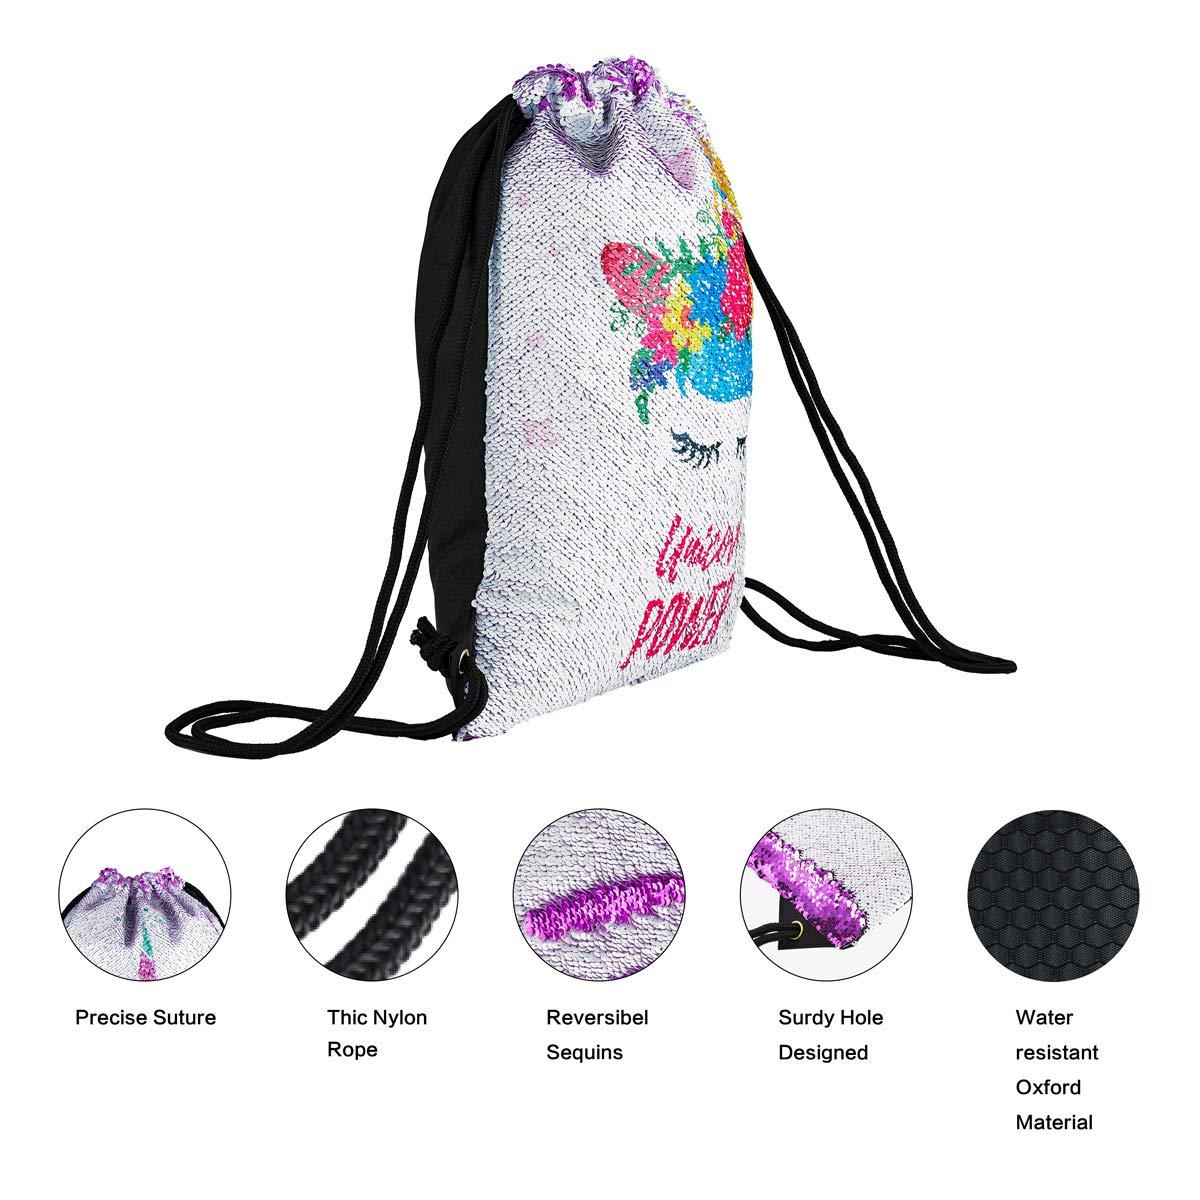 Unicorn Gift Sequin Mermaid Drawstring Backpack Gym Dance Bags for Girls Kids Magic Reversible Flip Sequin School Bag Shoulder Travel Bags Birthday Gift for Daughter Children Women Segorts